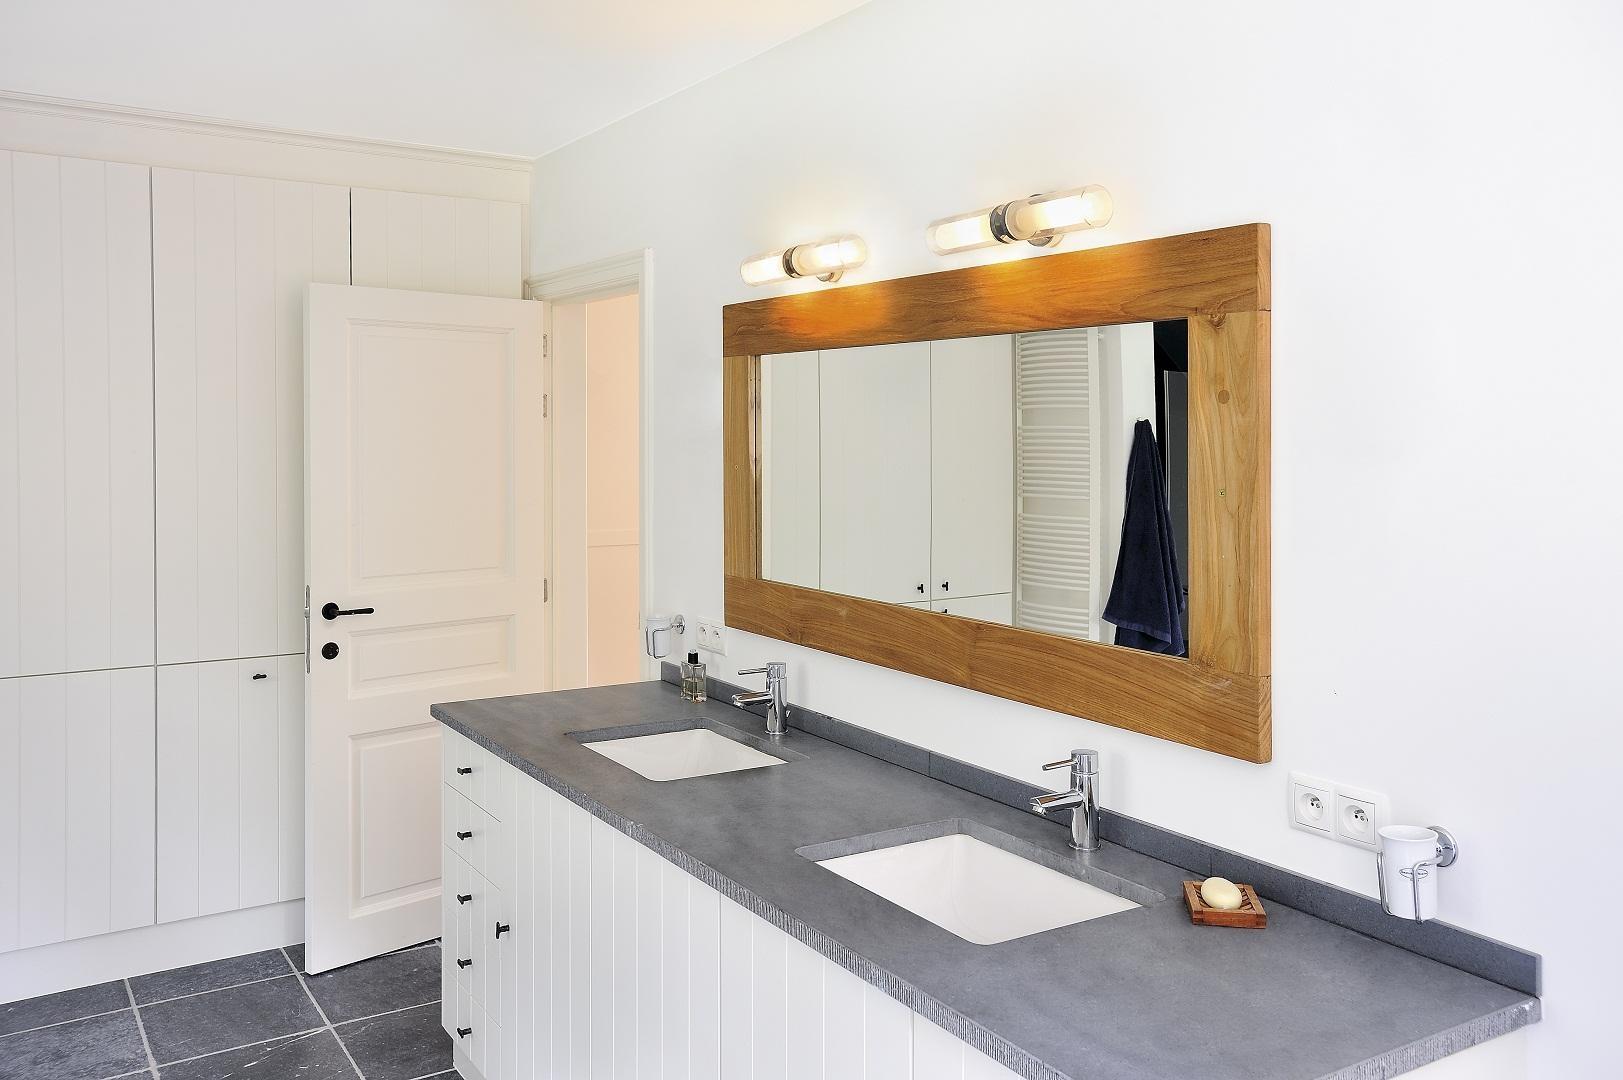 Bathroom Cabinets : Lovely Led Strip Lights For Bathroom Mirrors Intended For Led Strip Lights For Bathroom Mirrors (Image 2 of 20)